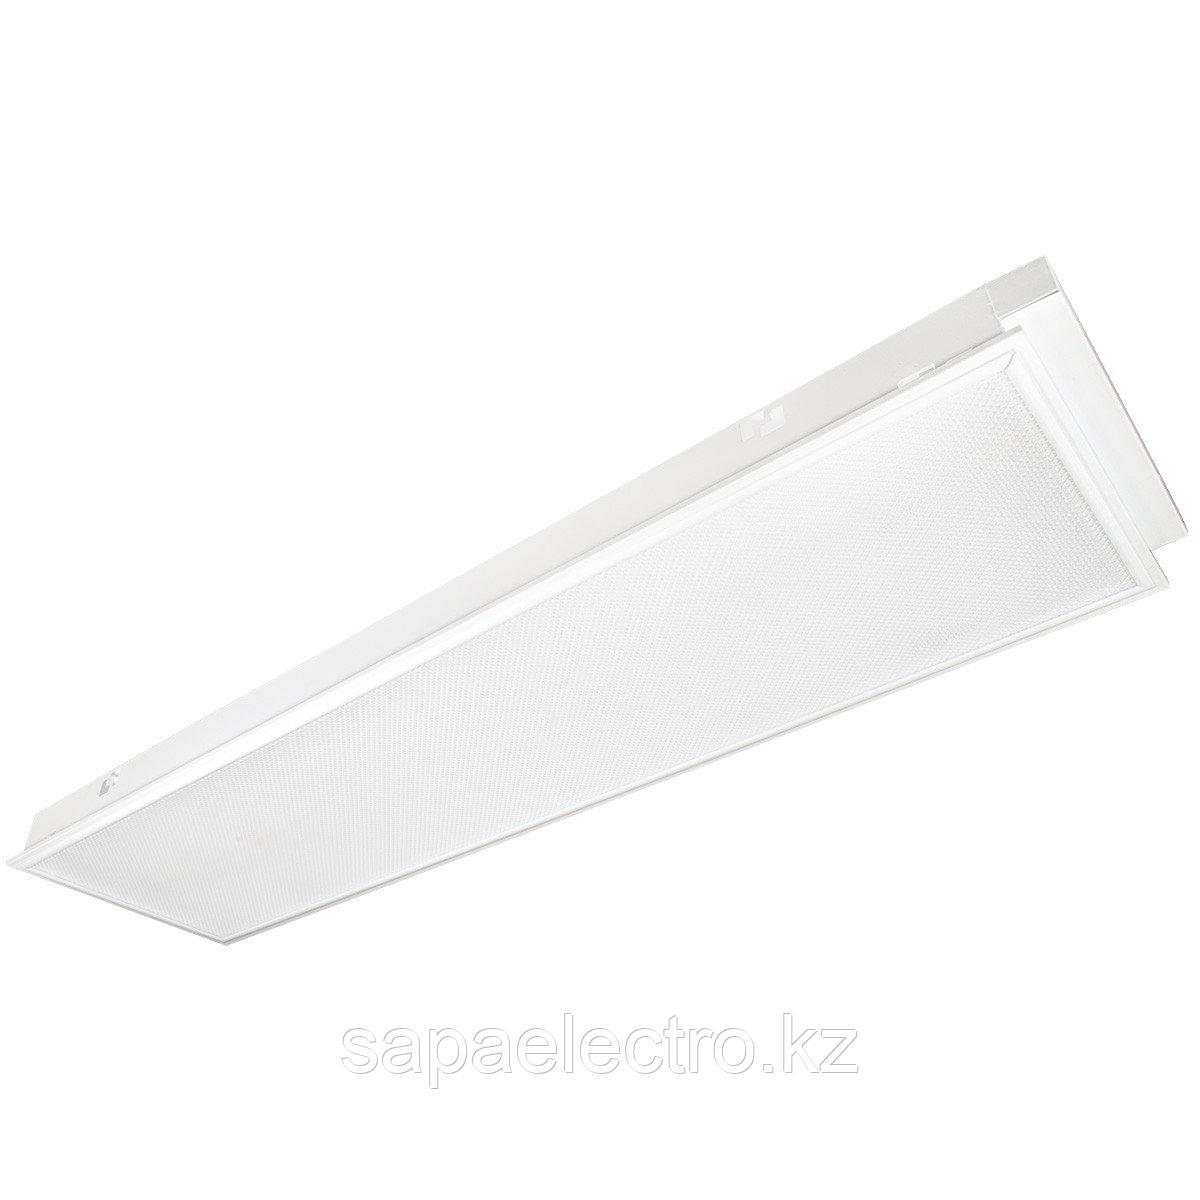 Cв-к PRIZMALED 8X9W/LZV 236 встр-й. MEGALUX